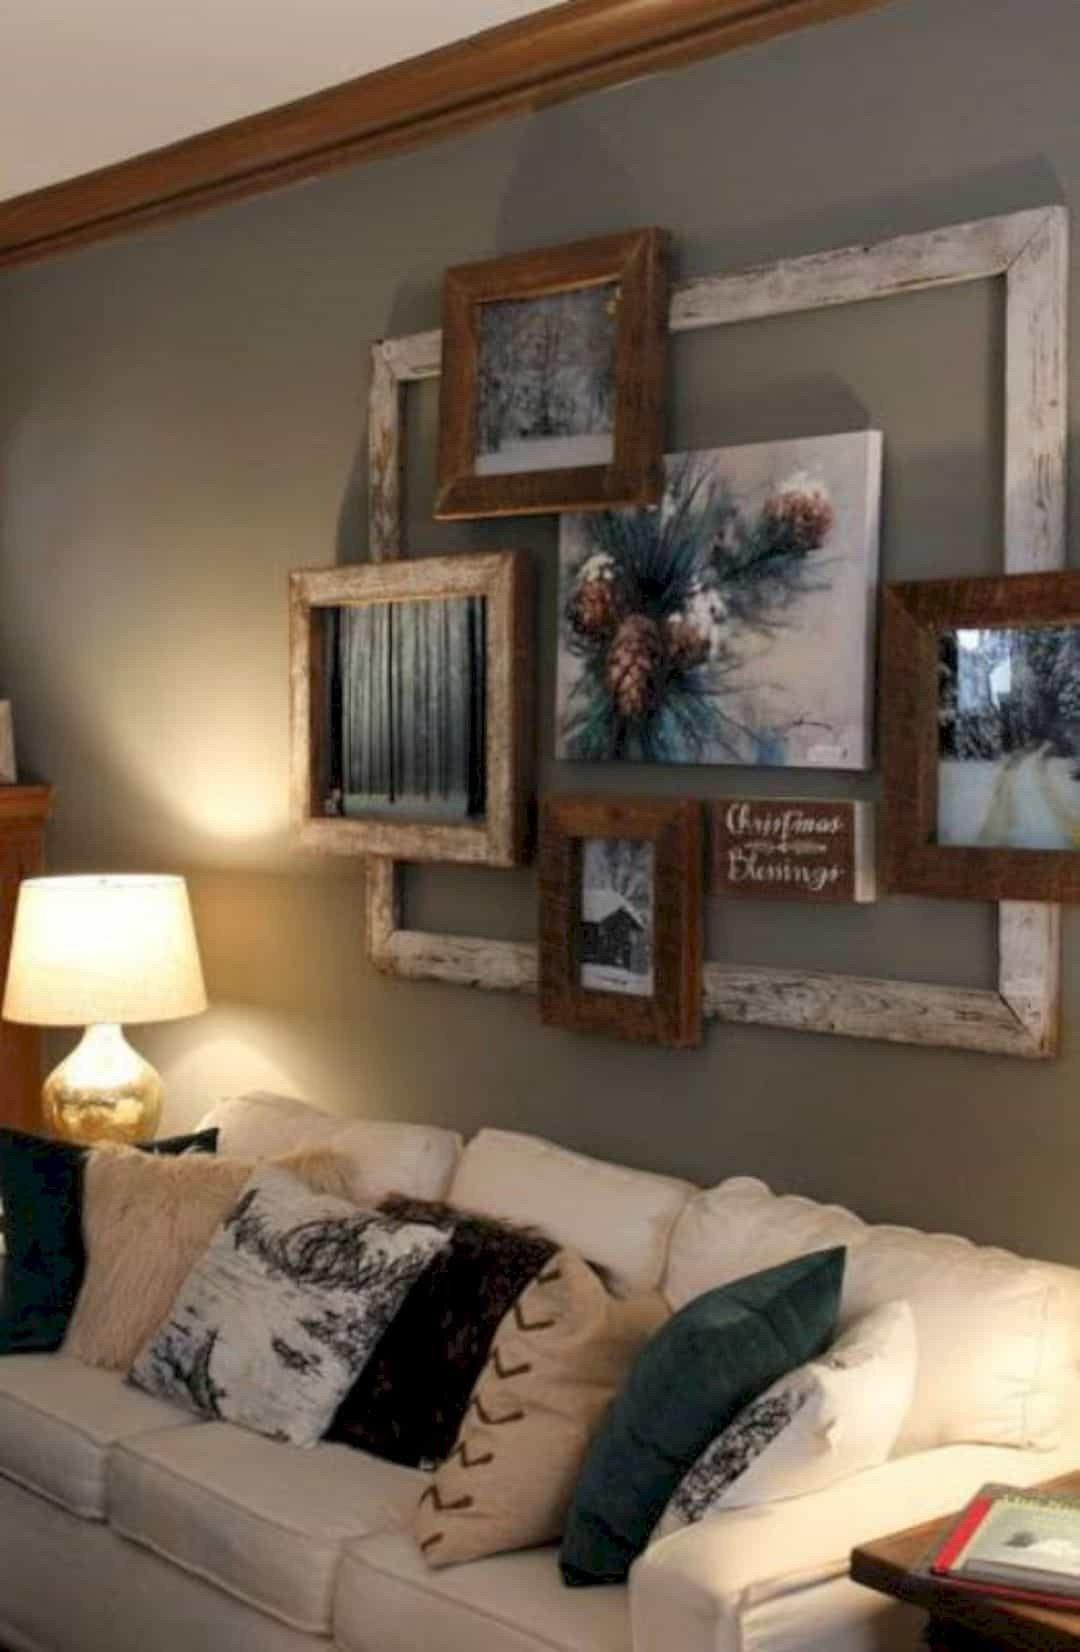 Small Living Room Diy Ideas Luxury 17 Diy Rustic Home Decor Ideas for Living Room